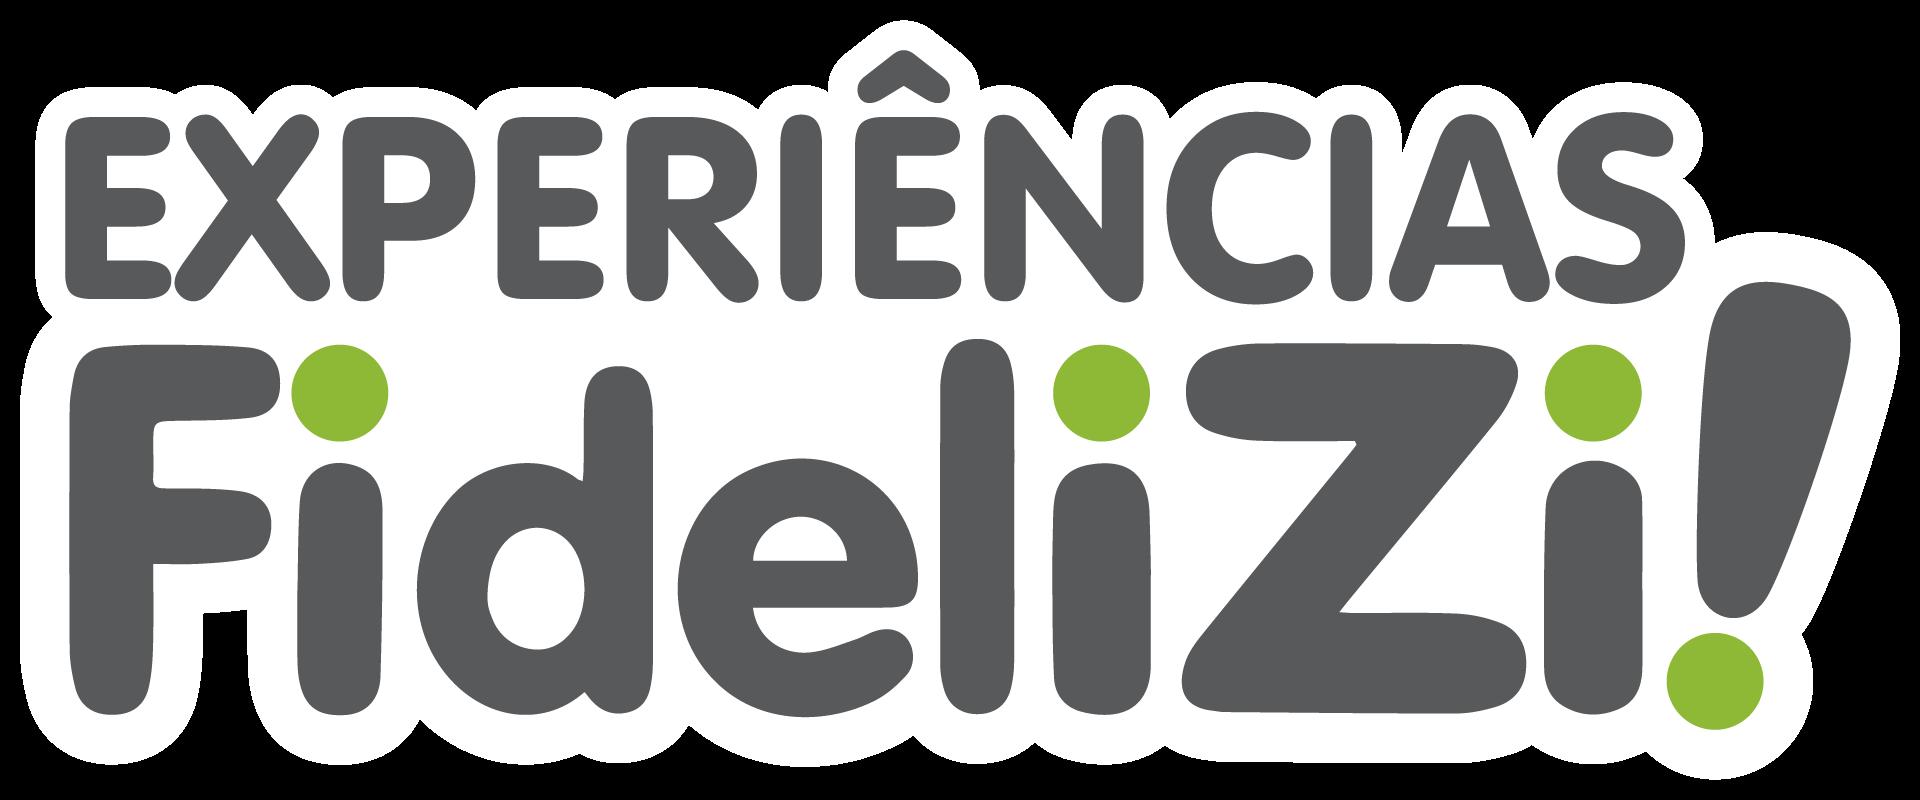 Experiências FideliZi! - série de vídeos com cases de sucesso de clientes FideliZi!